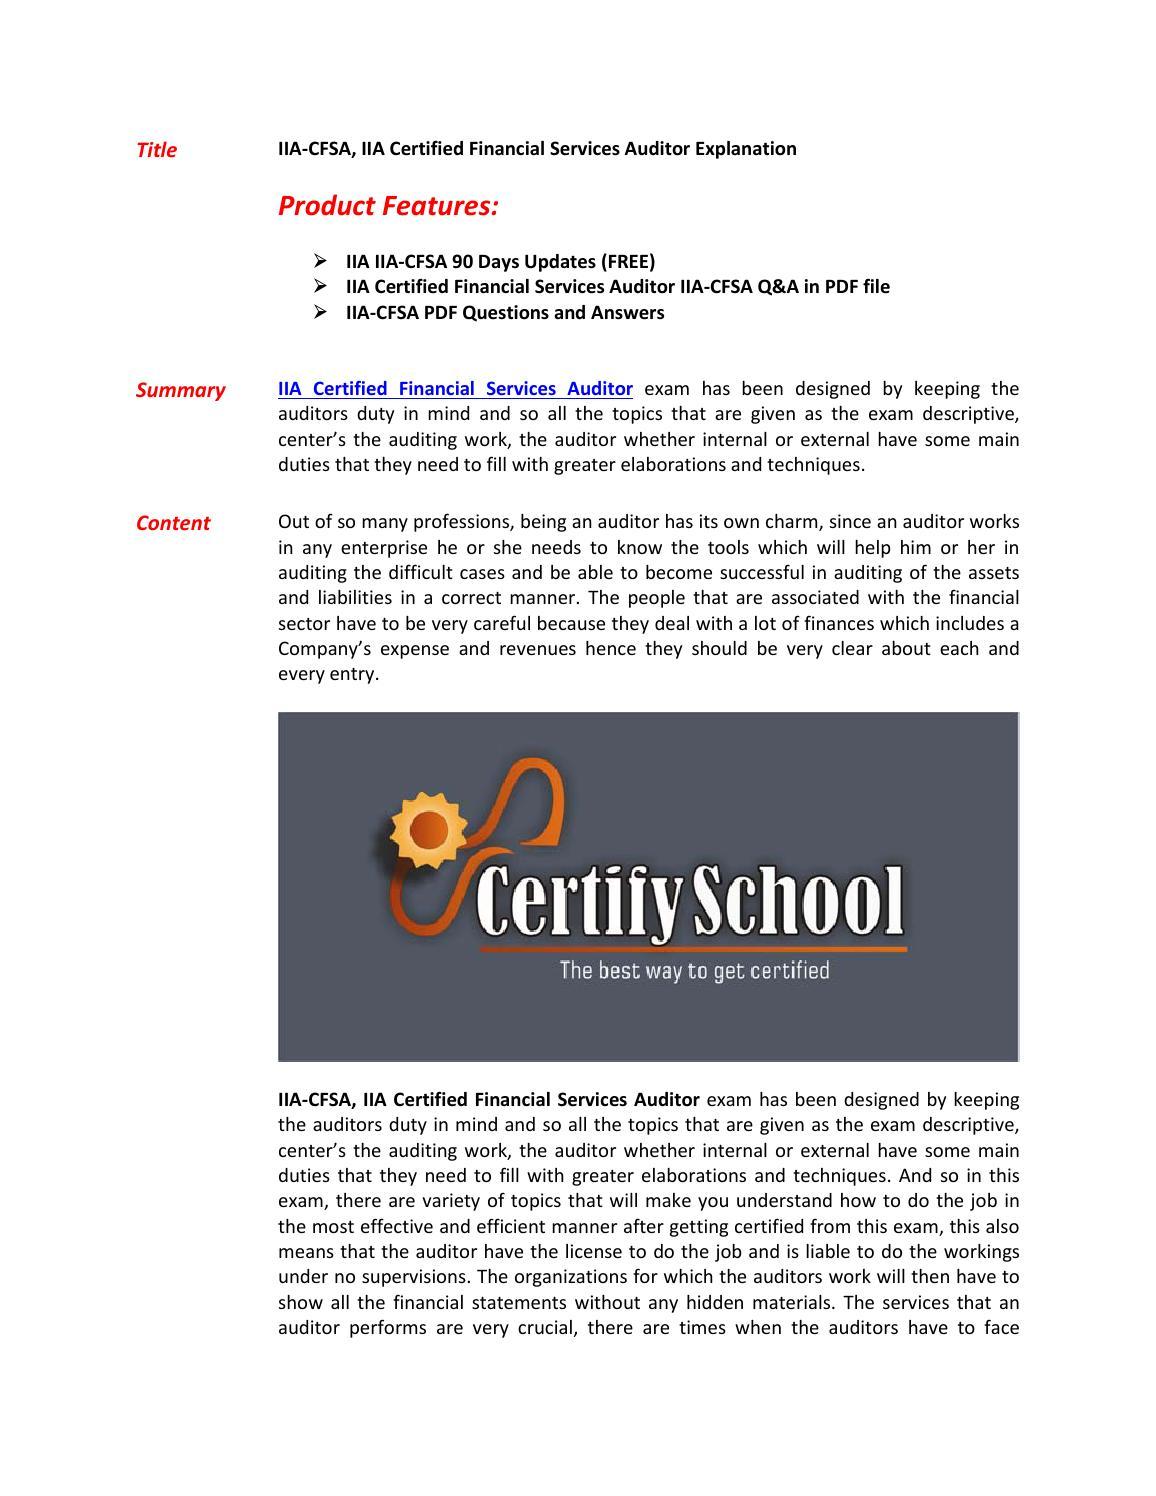 IIA-CFSA Exam Questions & Answers by batmaek - issuu